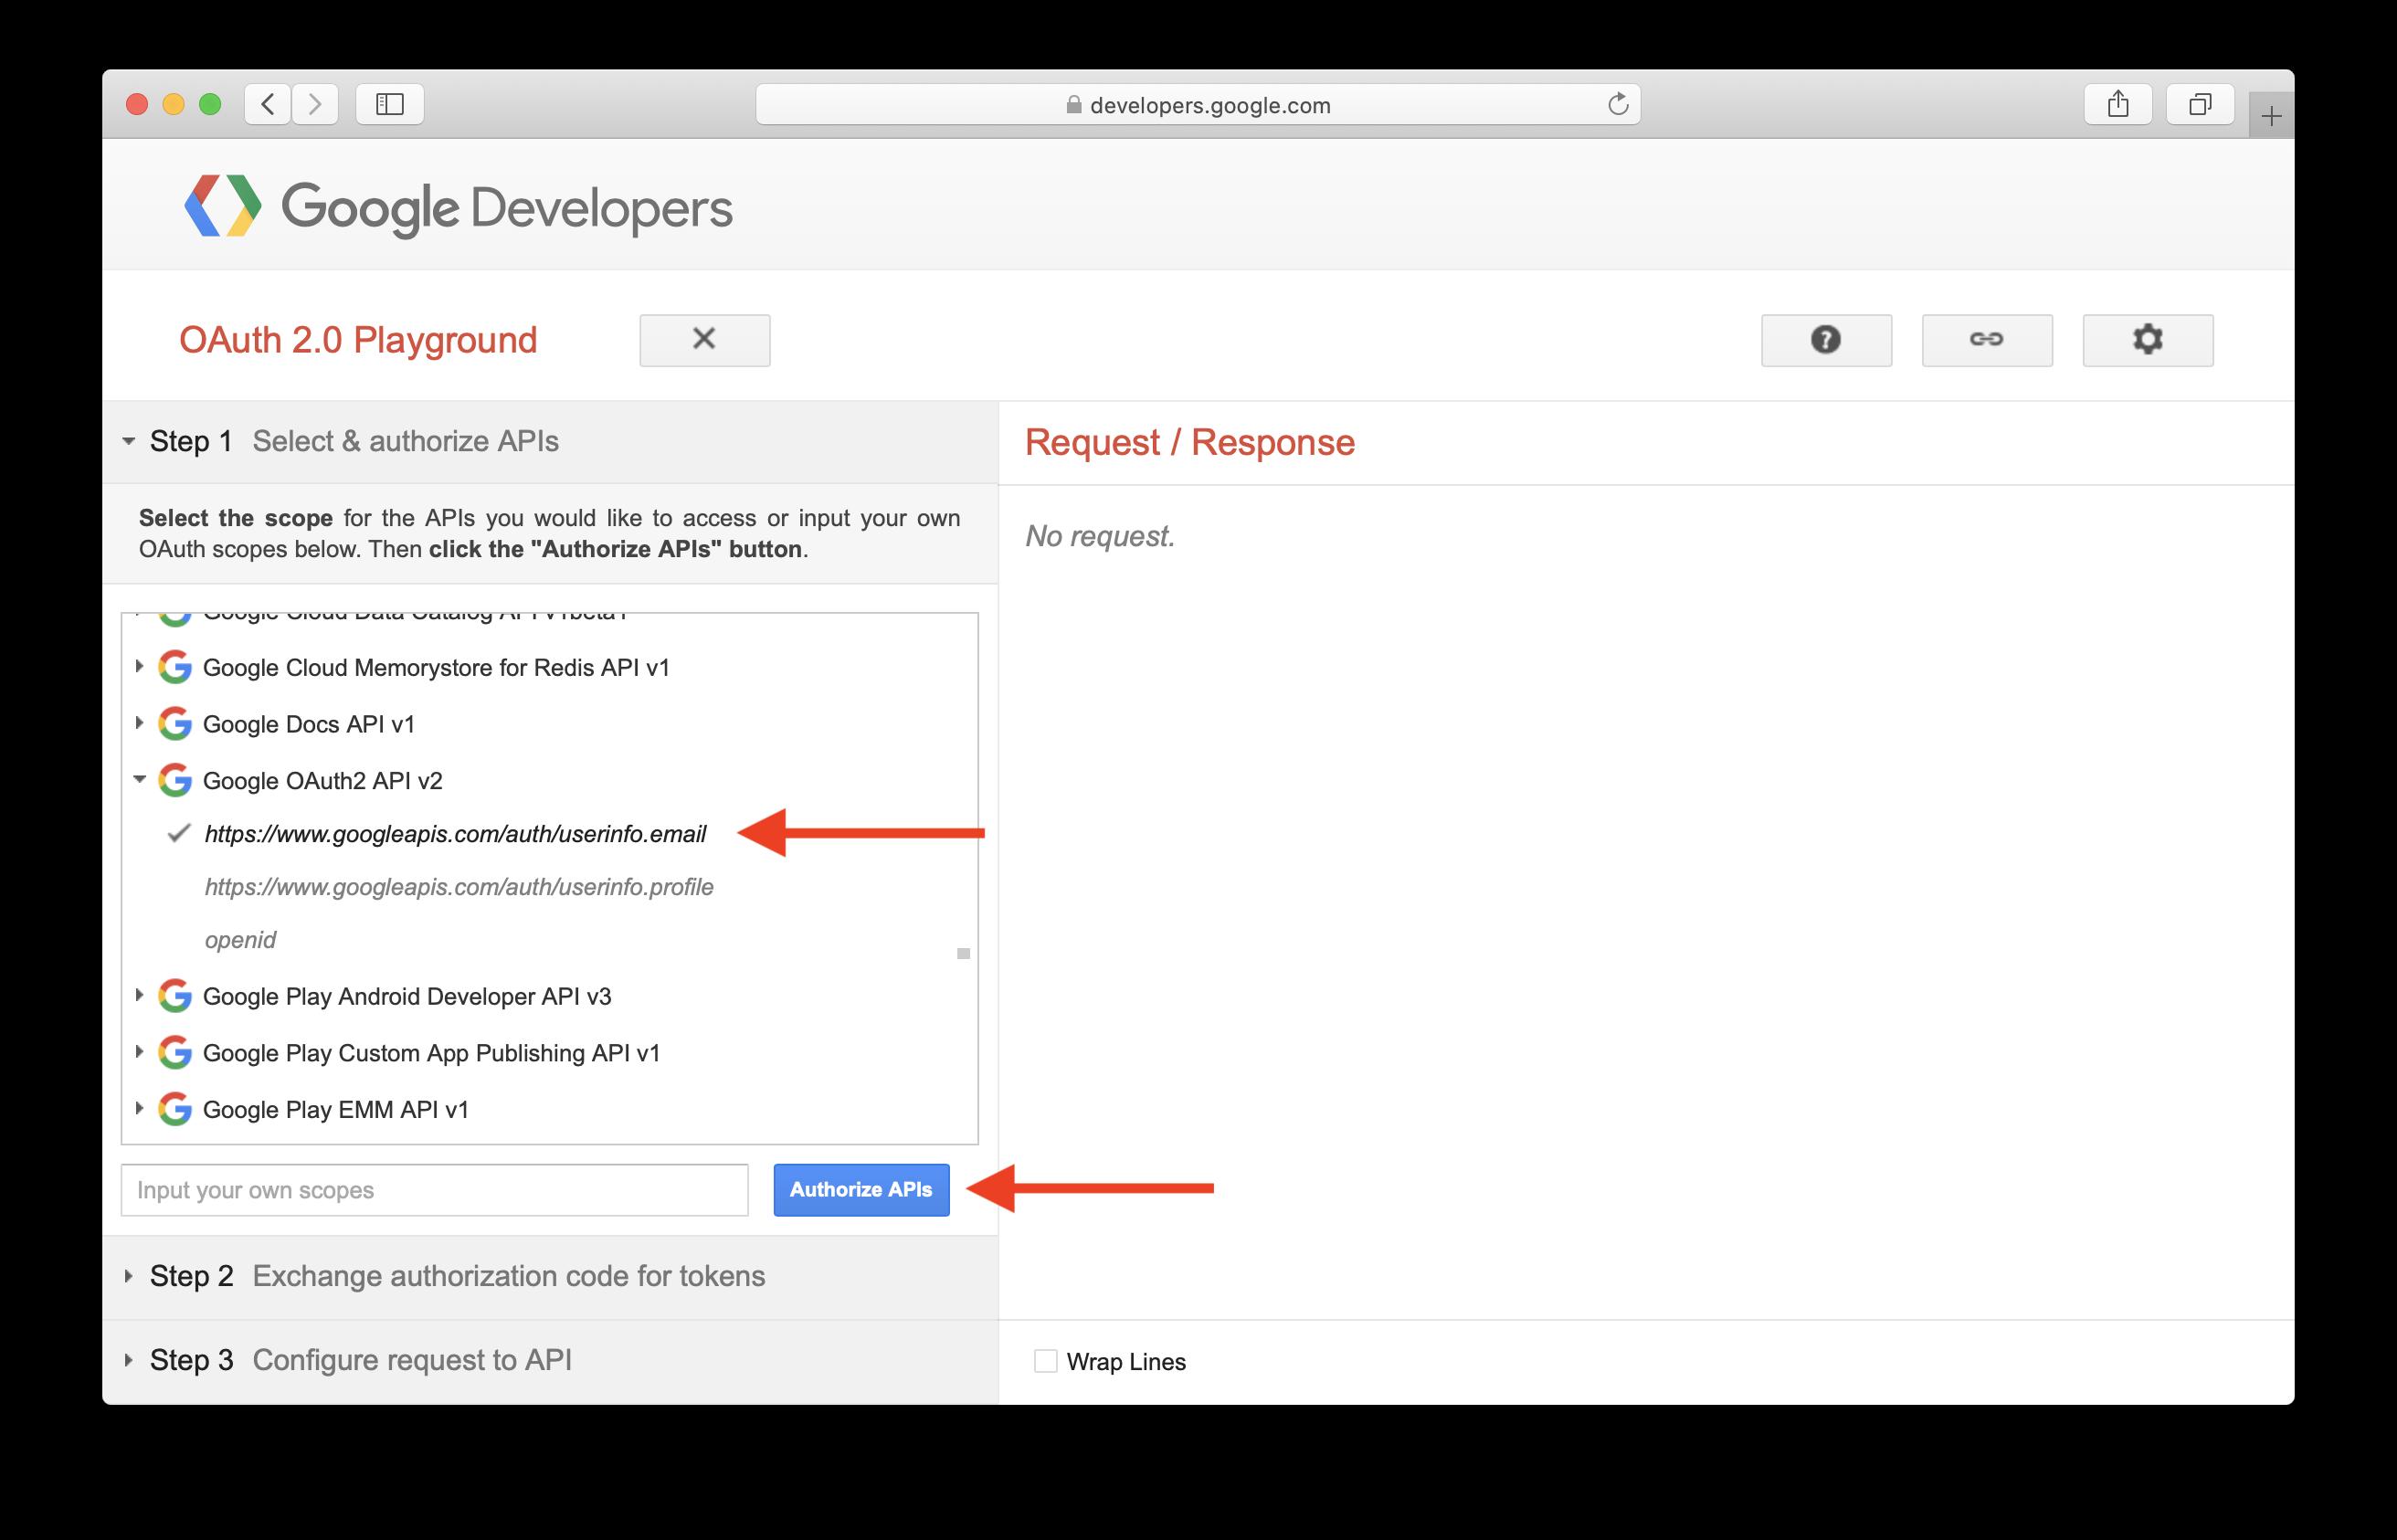 Select Google OAuth2 API v2